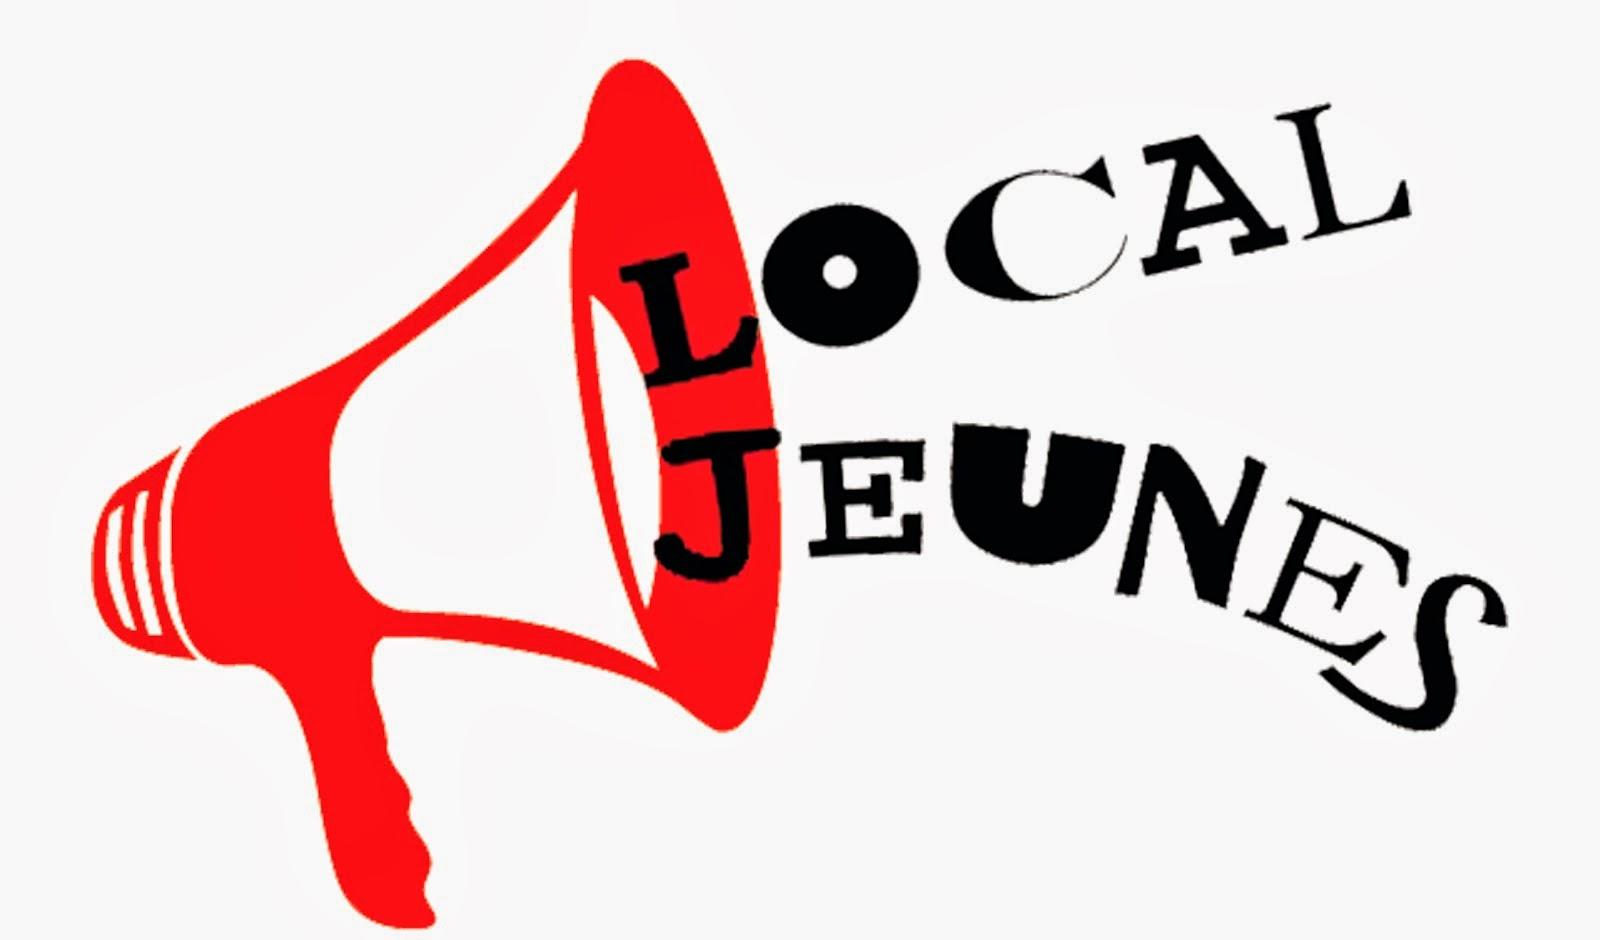 localjeunes